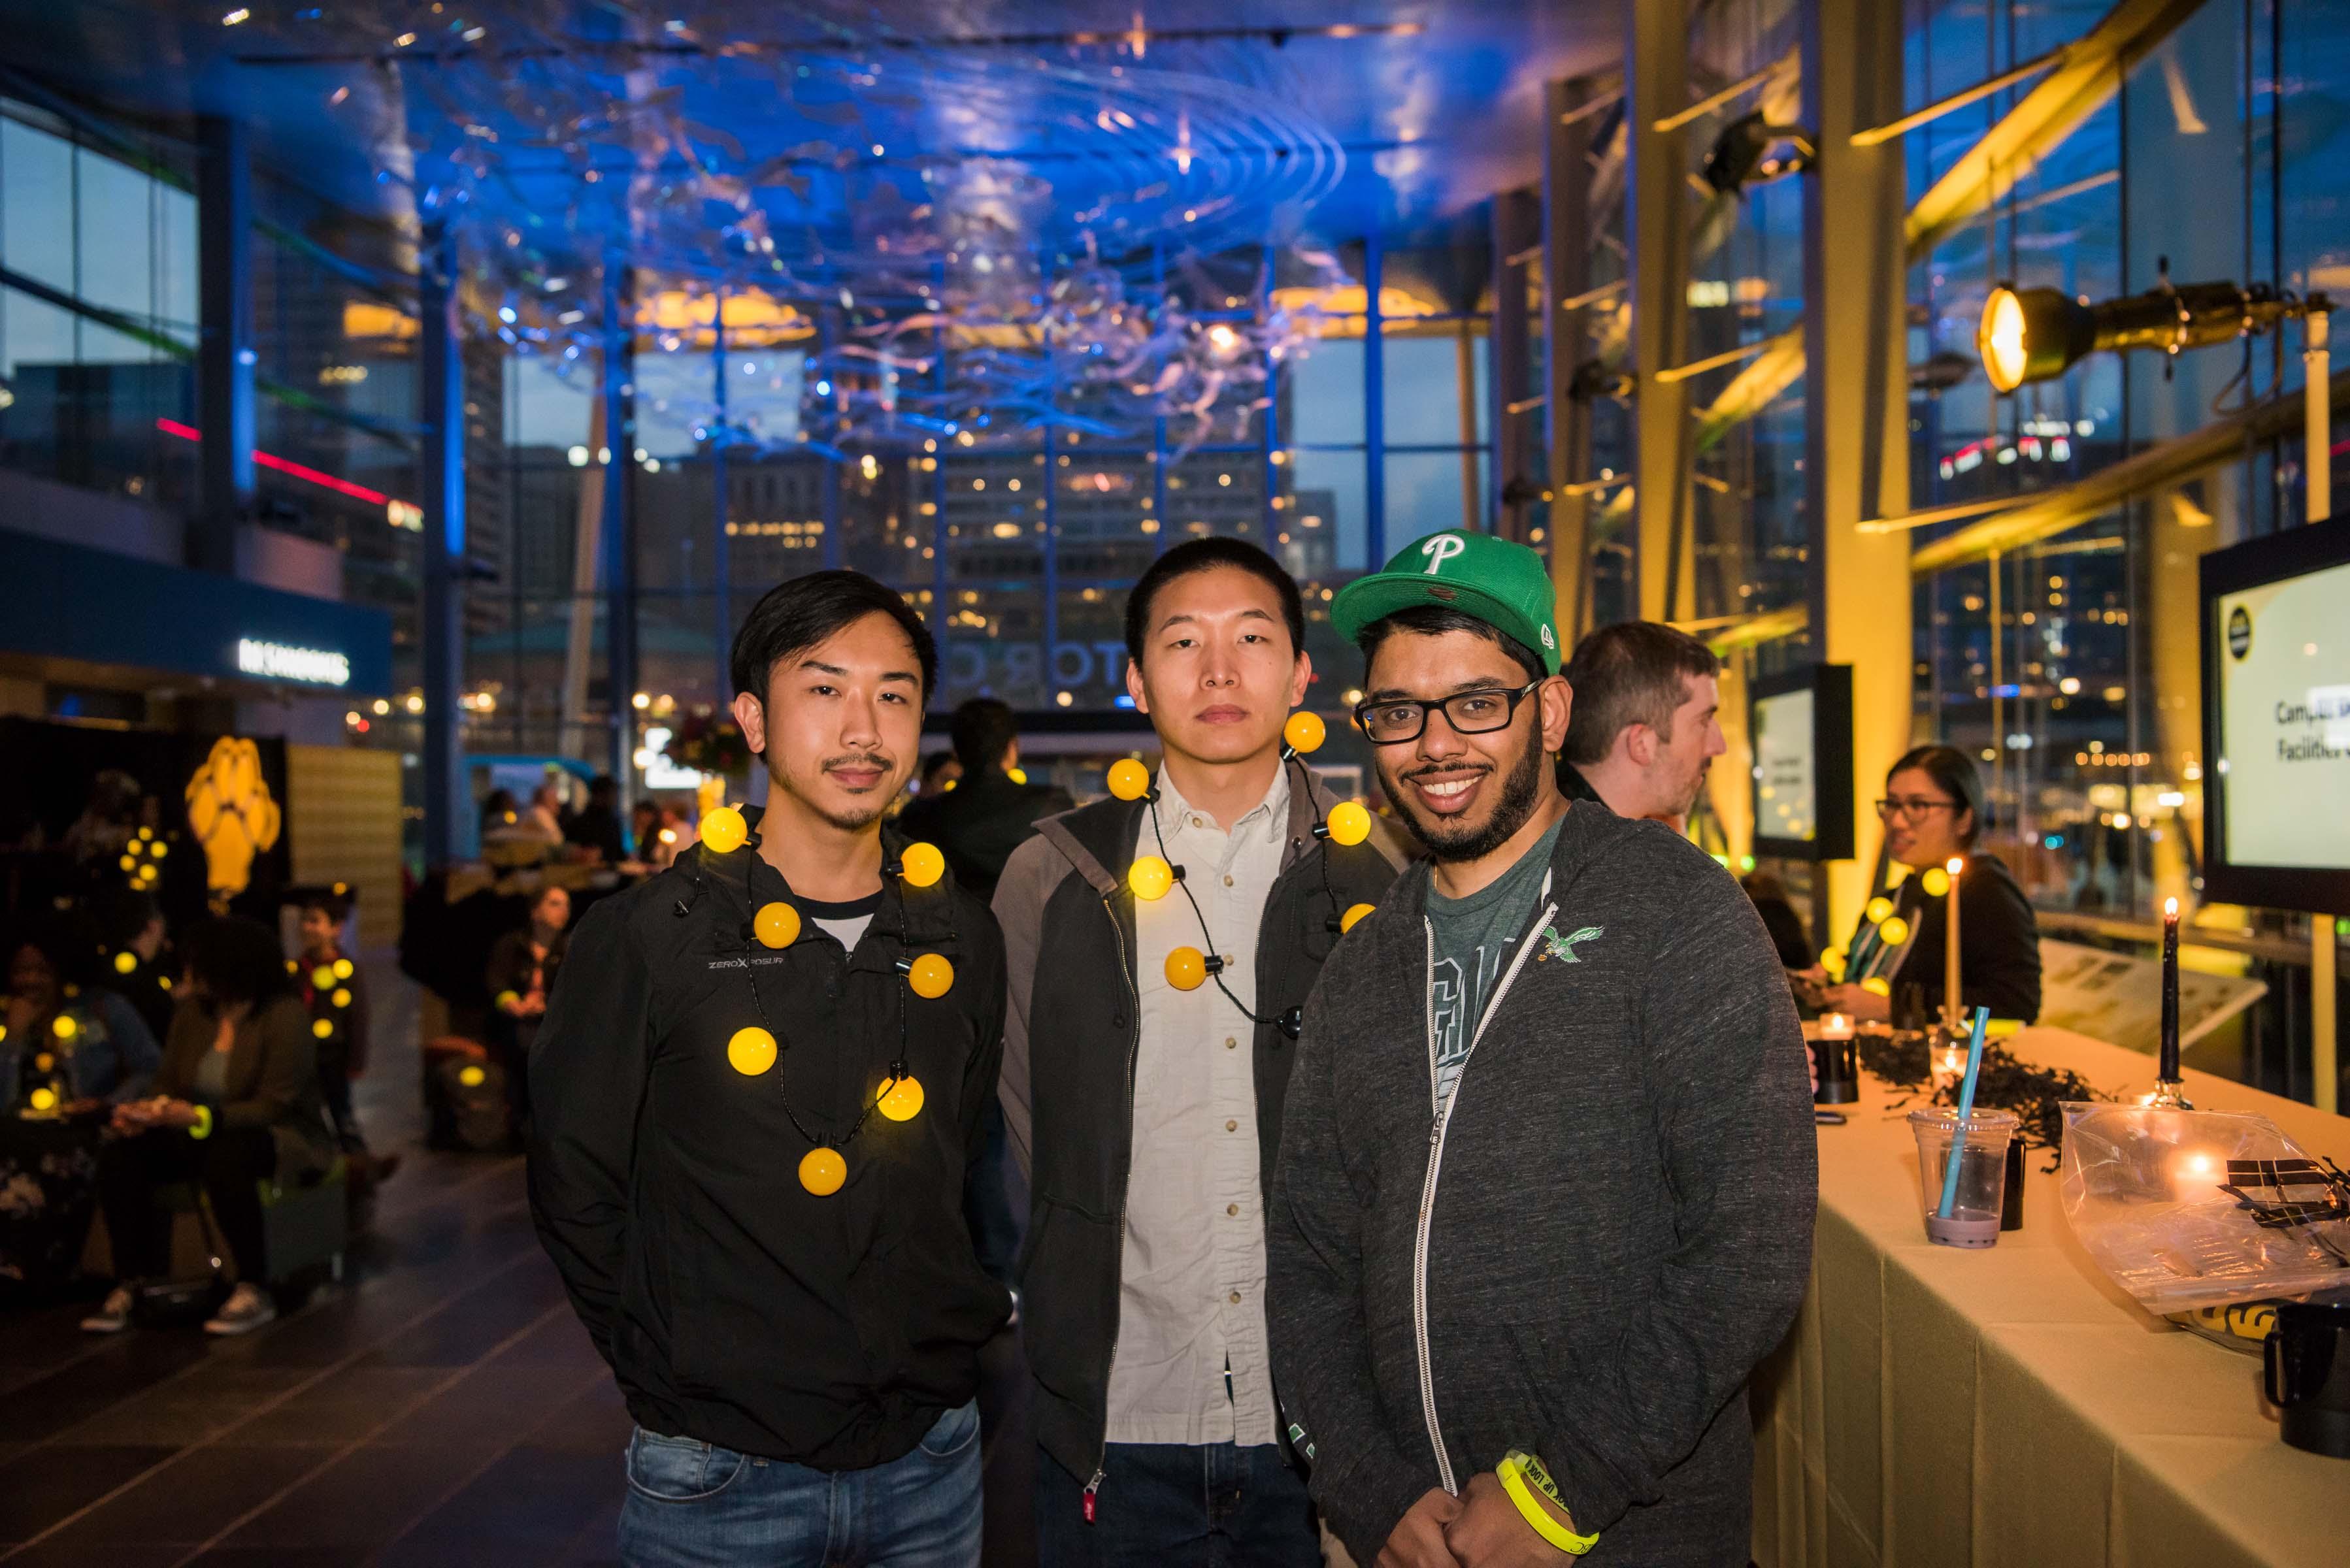 Three guys pose together at light city alumni reception